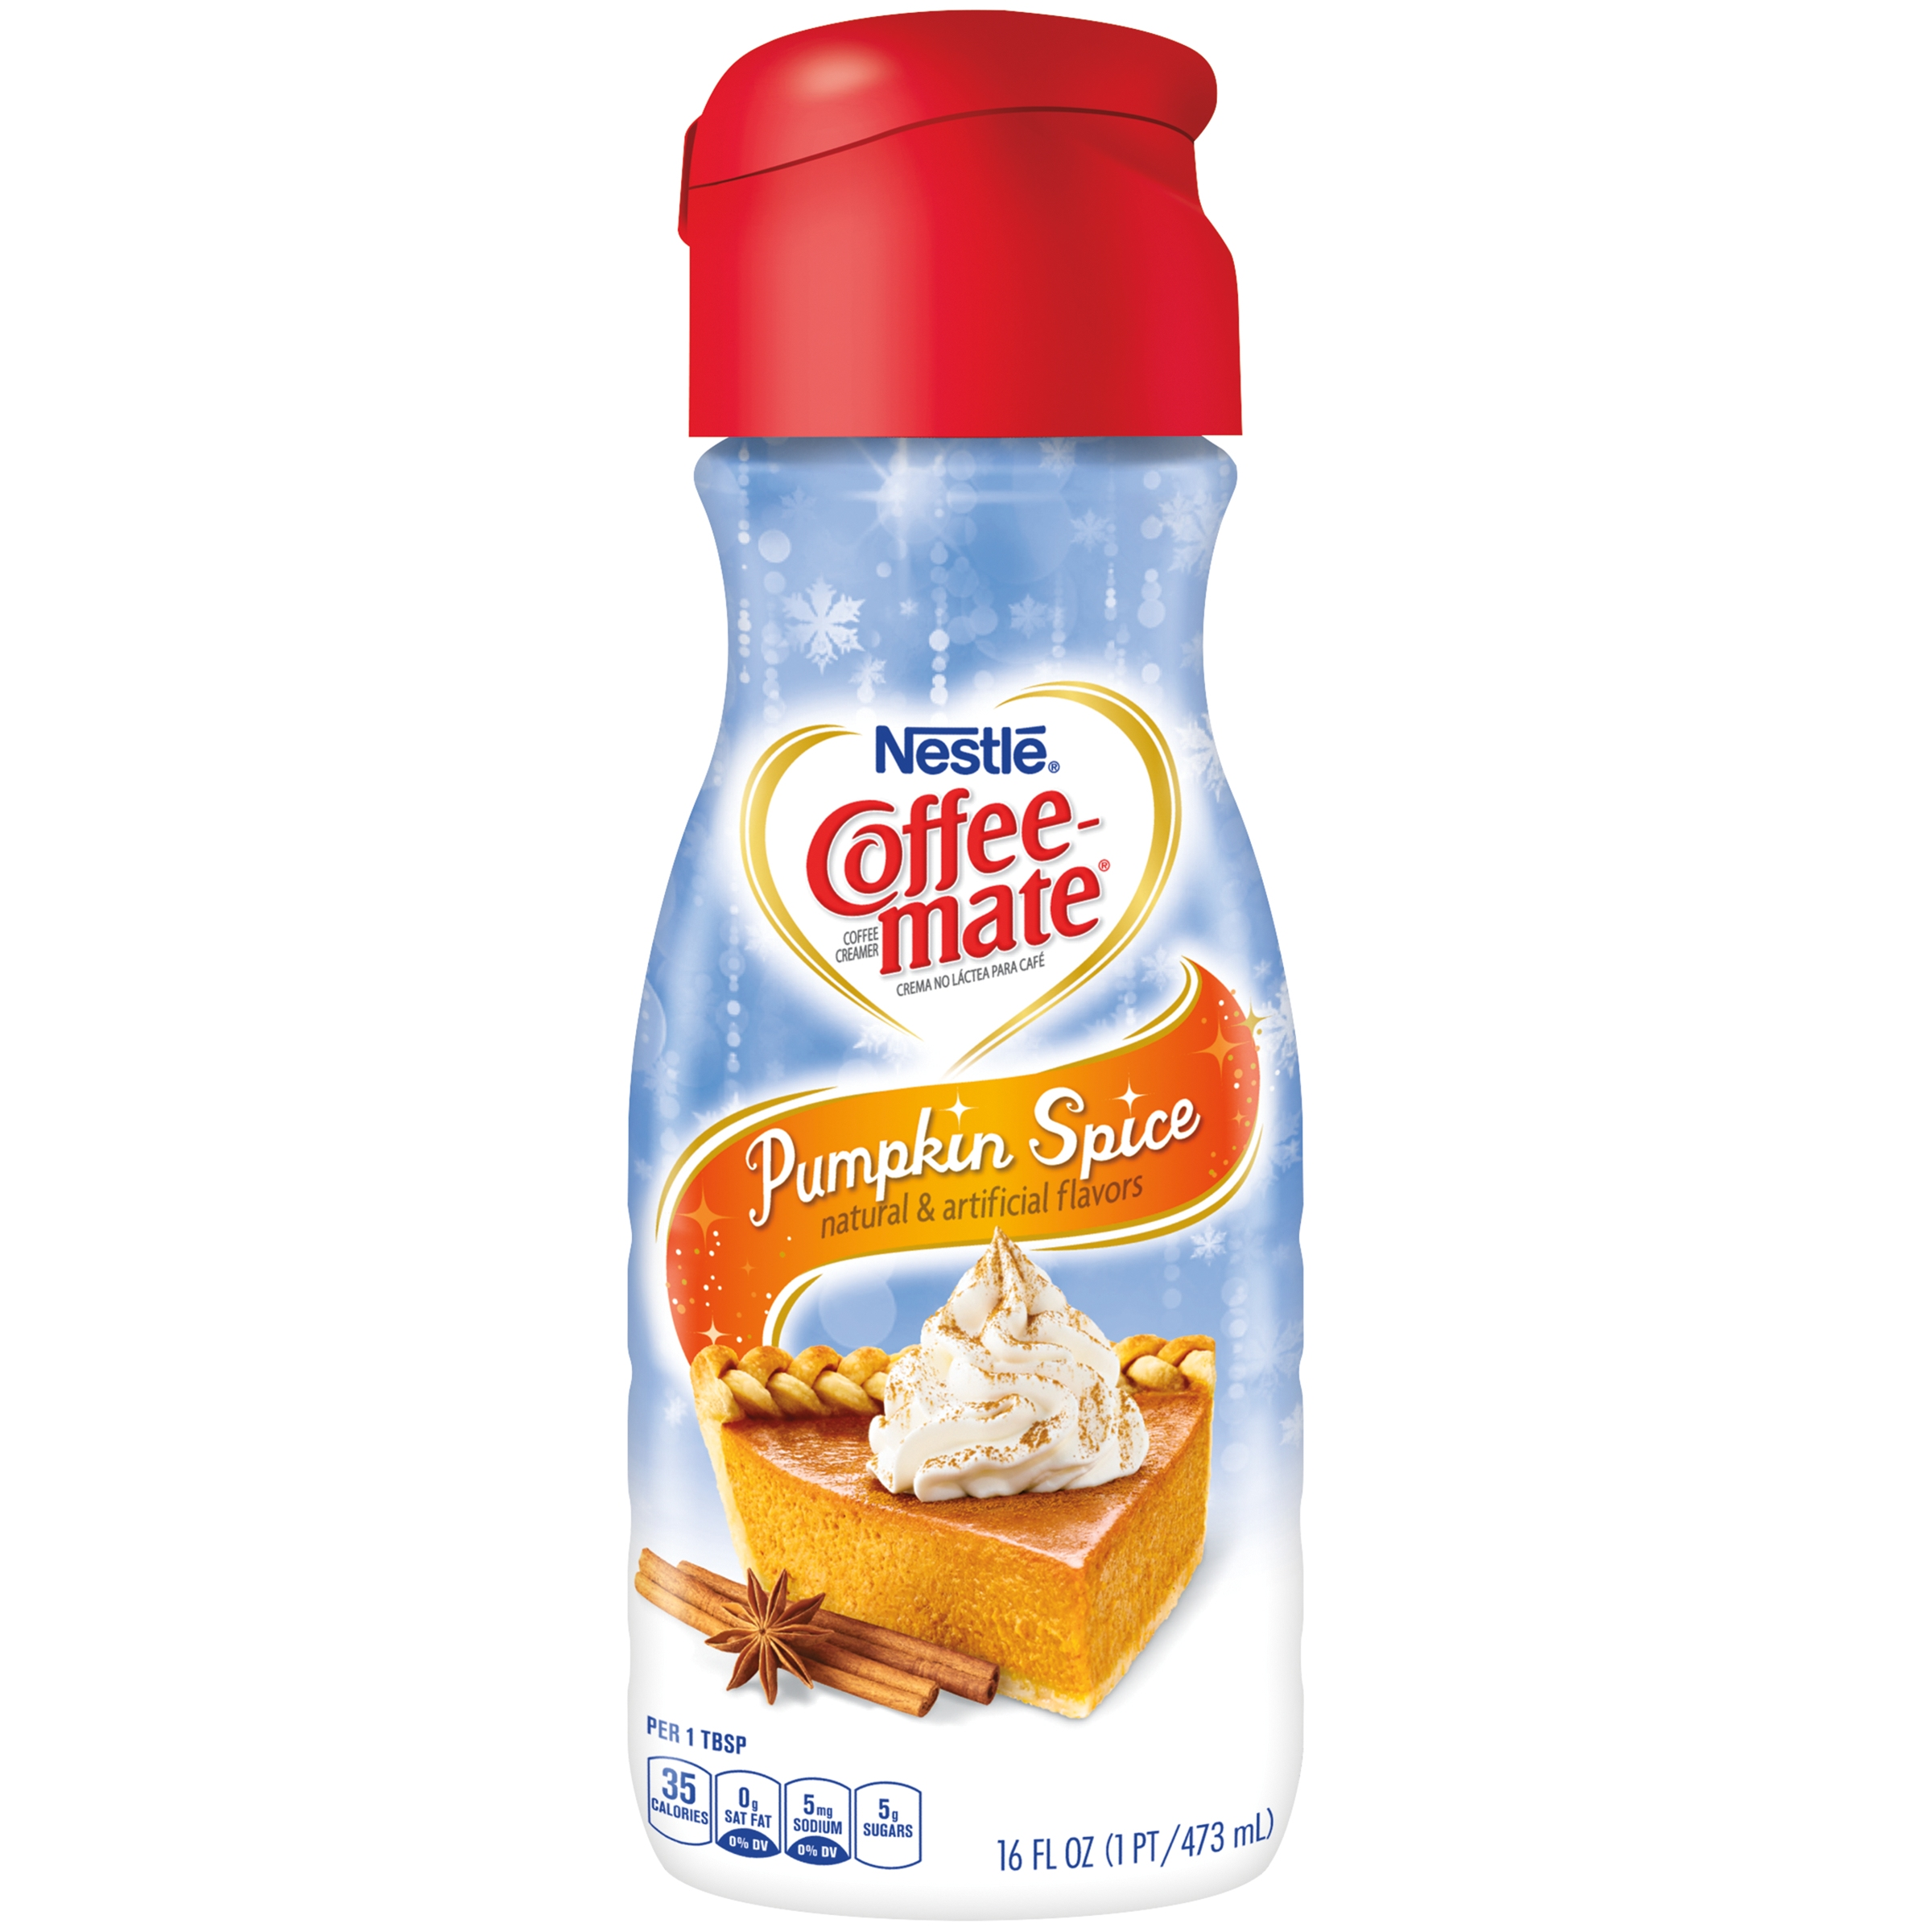 COFFEE MATE Pumpkin Spice Liquid Coffee Creamer 16 Fl. Oz. Bottle    Walmart.com